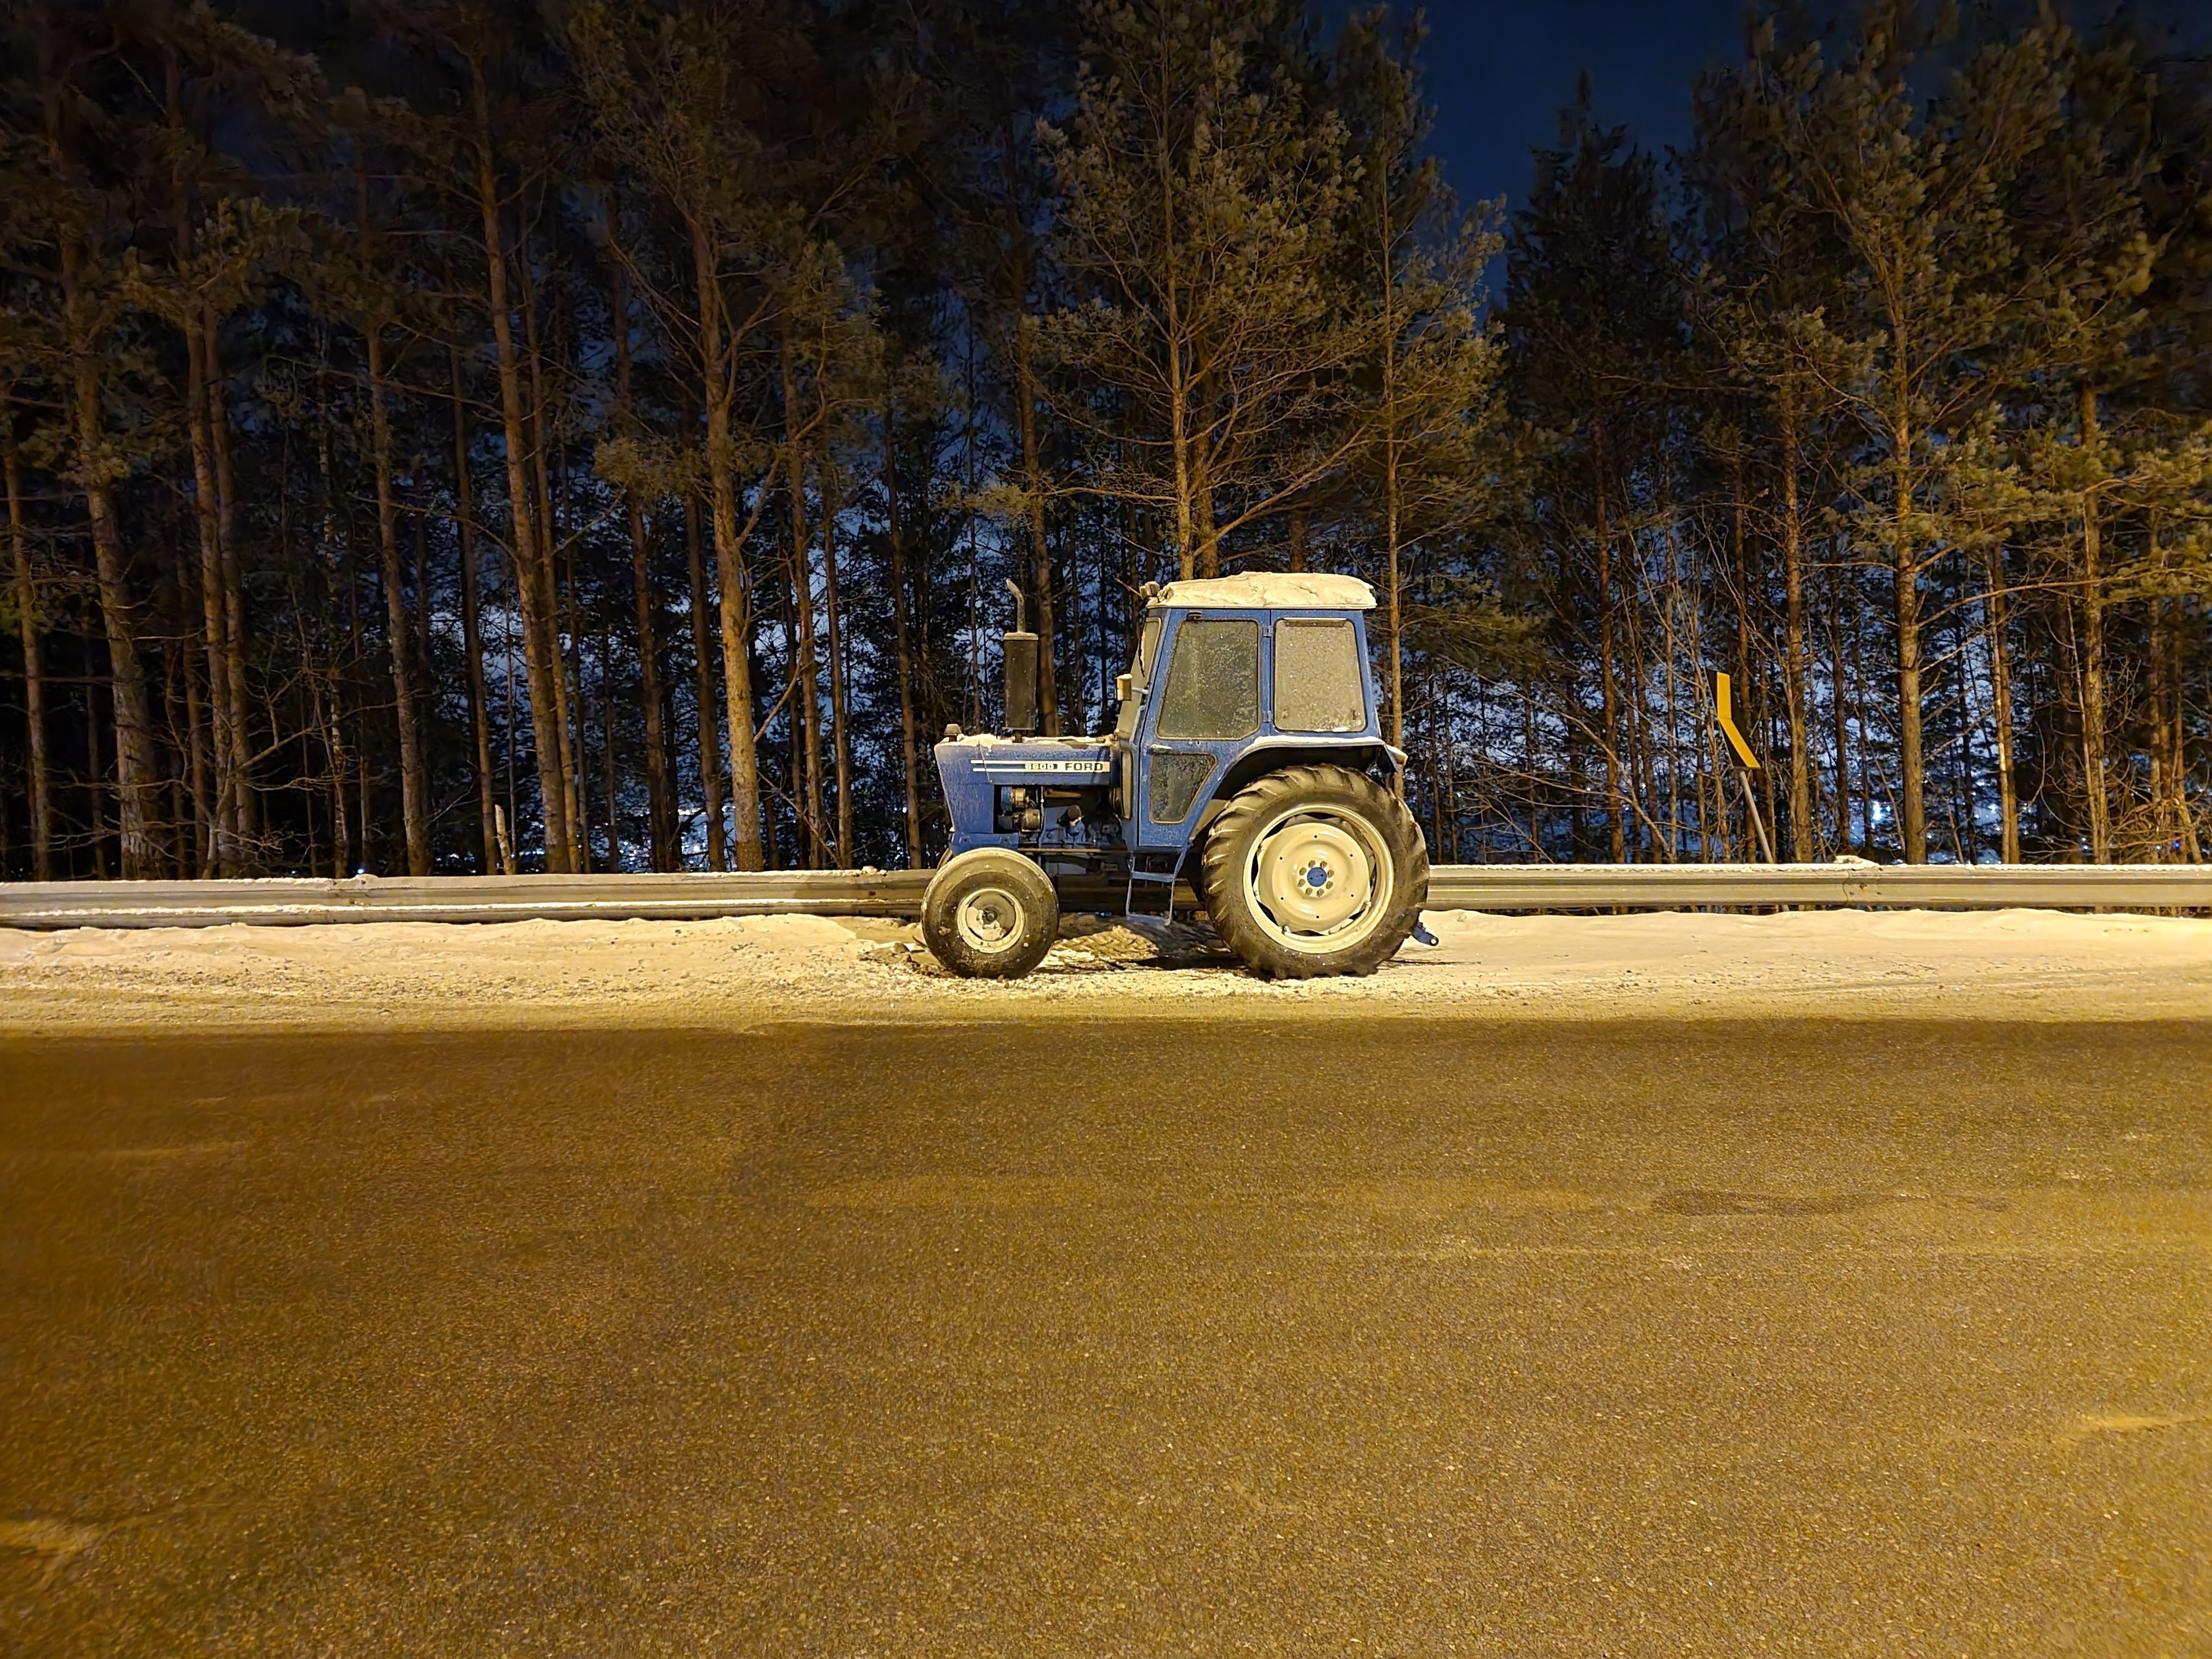 Enda en traktor i nattmodus.